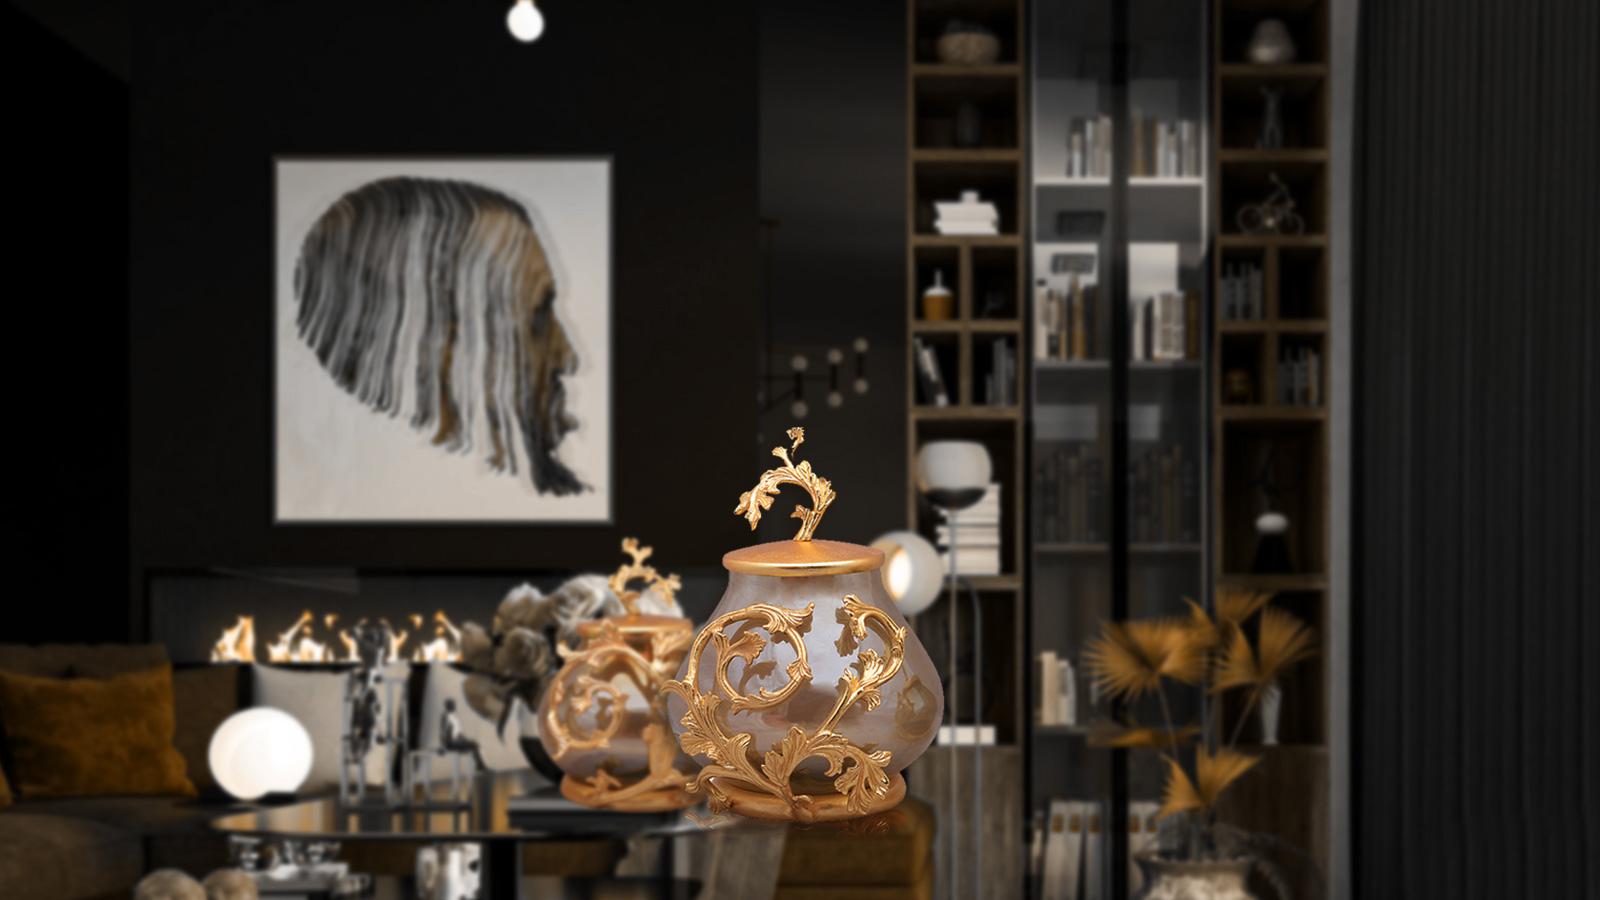 glass decorative objects, brass decorative objects, luxury pieces, gold decorative objects